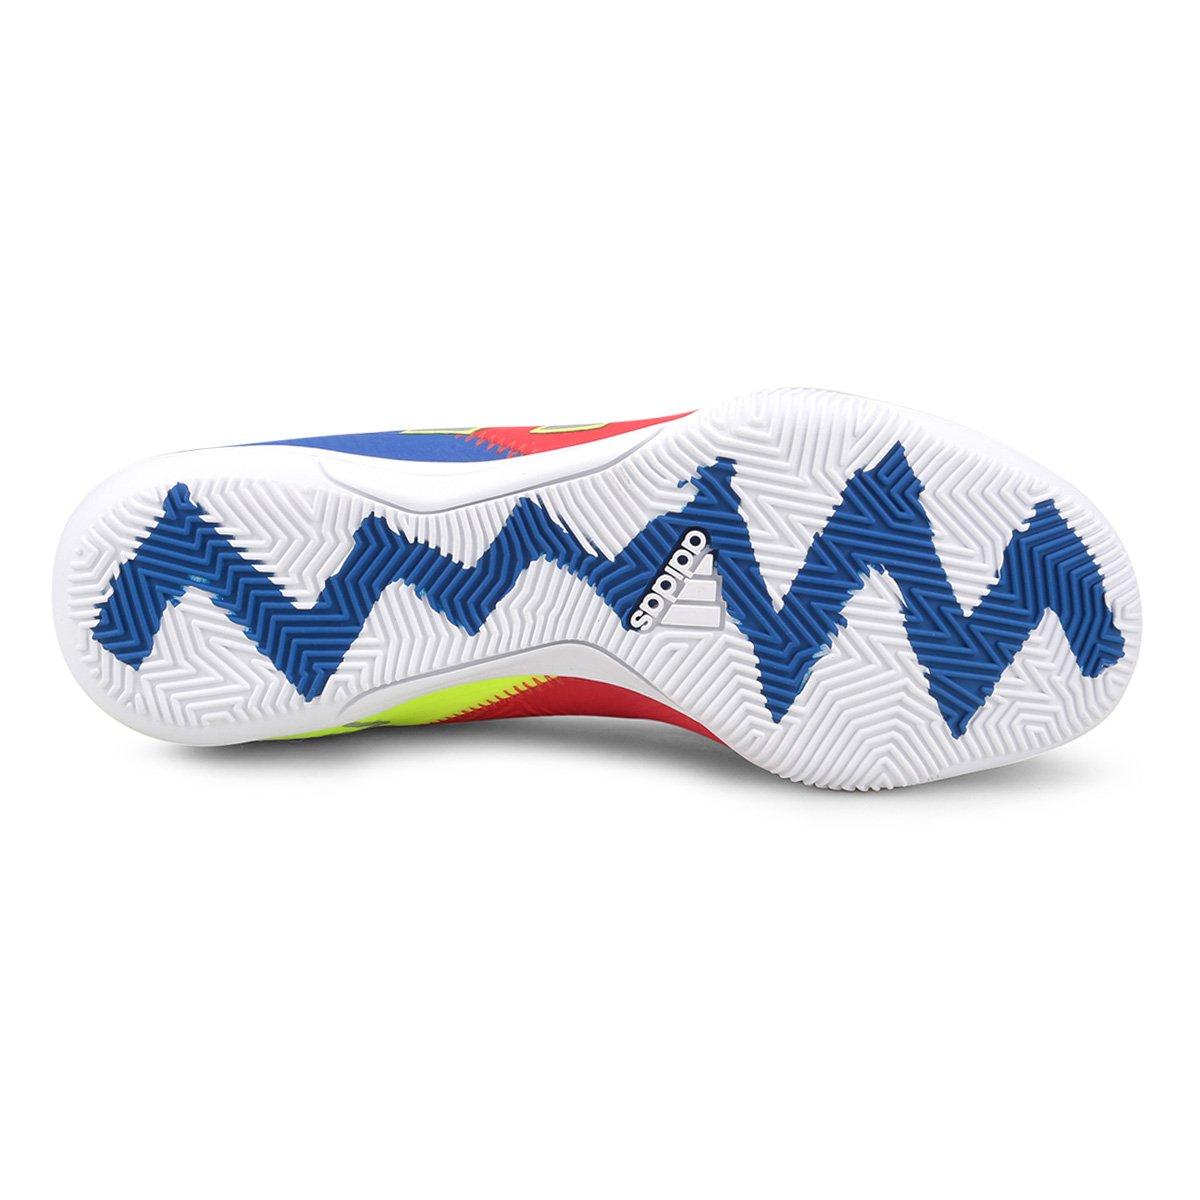 cc459deeab Chuteira Futsal Adidas Nemeziz Messi 18 3 IN - Vermelho e Azul ...